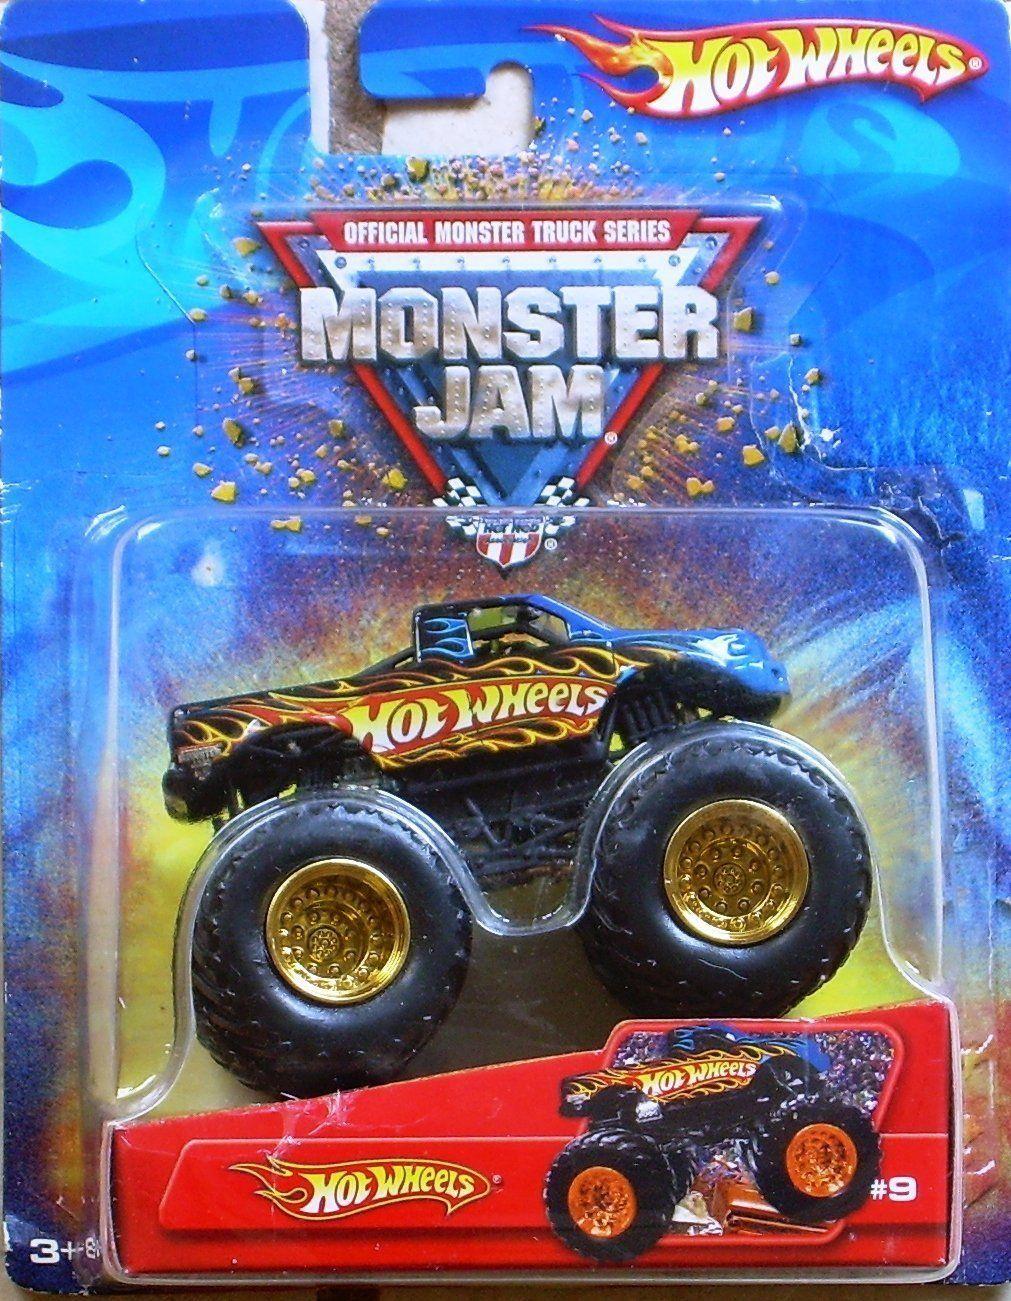 Amazon Com Hotwheels Monster Jam Truck 9 2006 Toys Games Hot Wheels Toys Monster Trucks Monster Jam